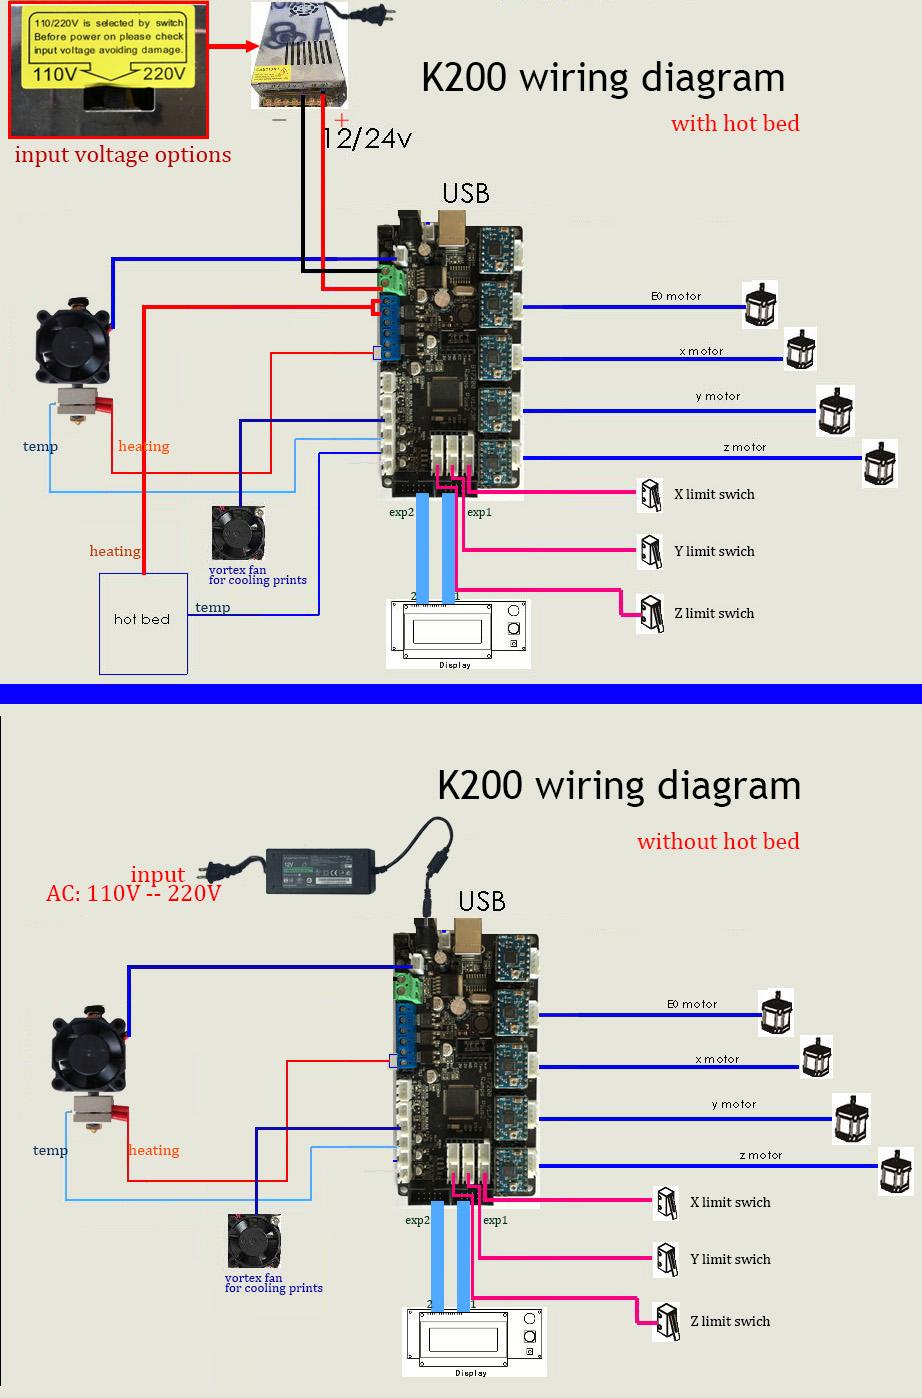 Ramps 1.4 Wiring Diagram : ramps, wiring, diagram, DIAGRAM], Wiring, Diagrams, Version, Quality, AIDDIAGRAM.ASSOPREPARATORI.IT